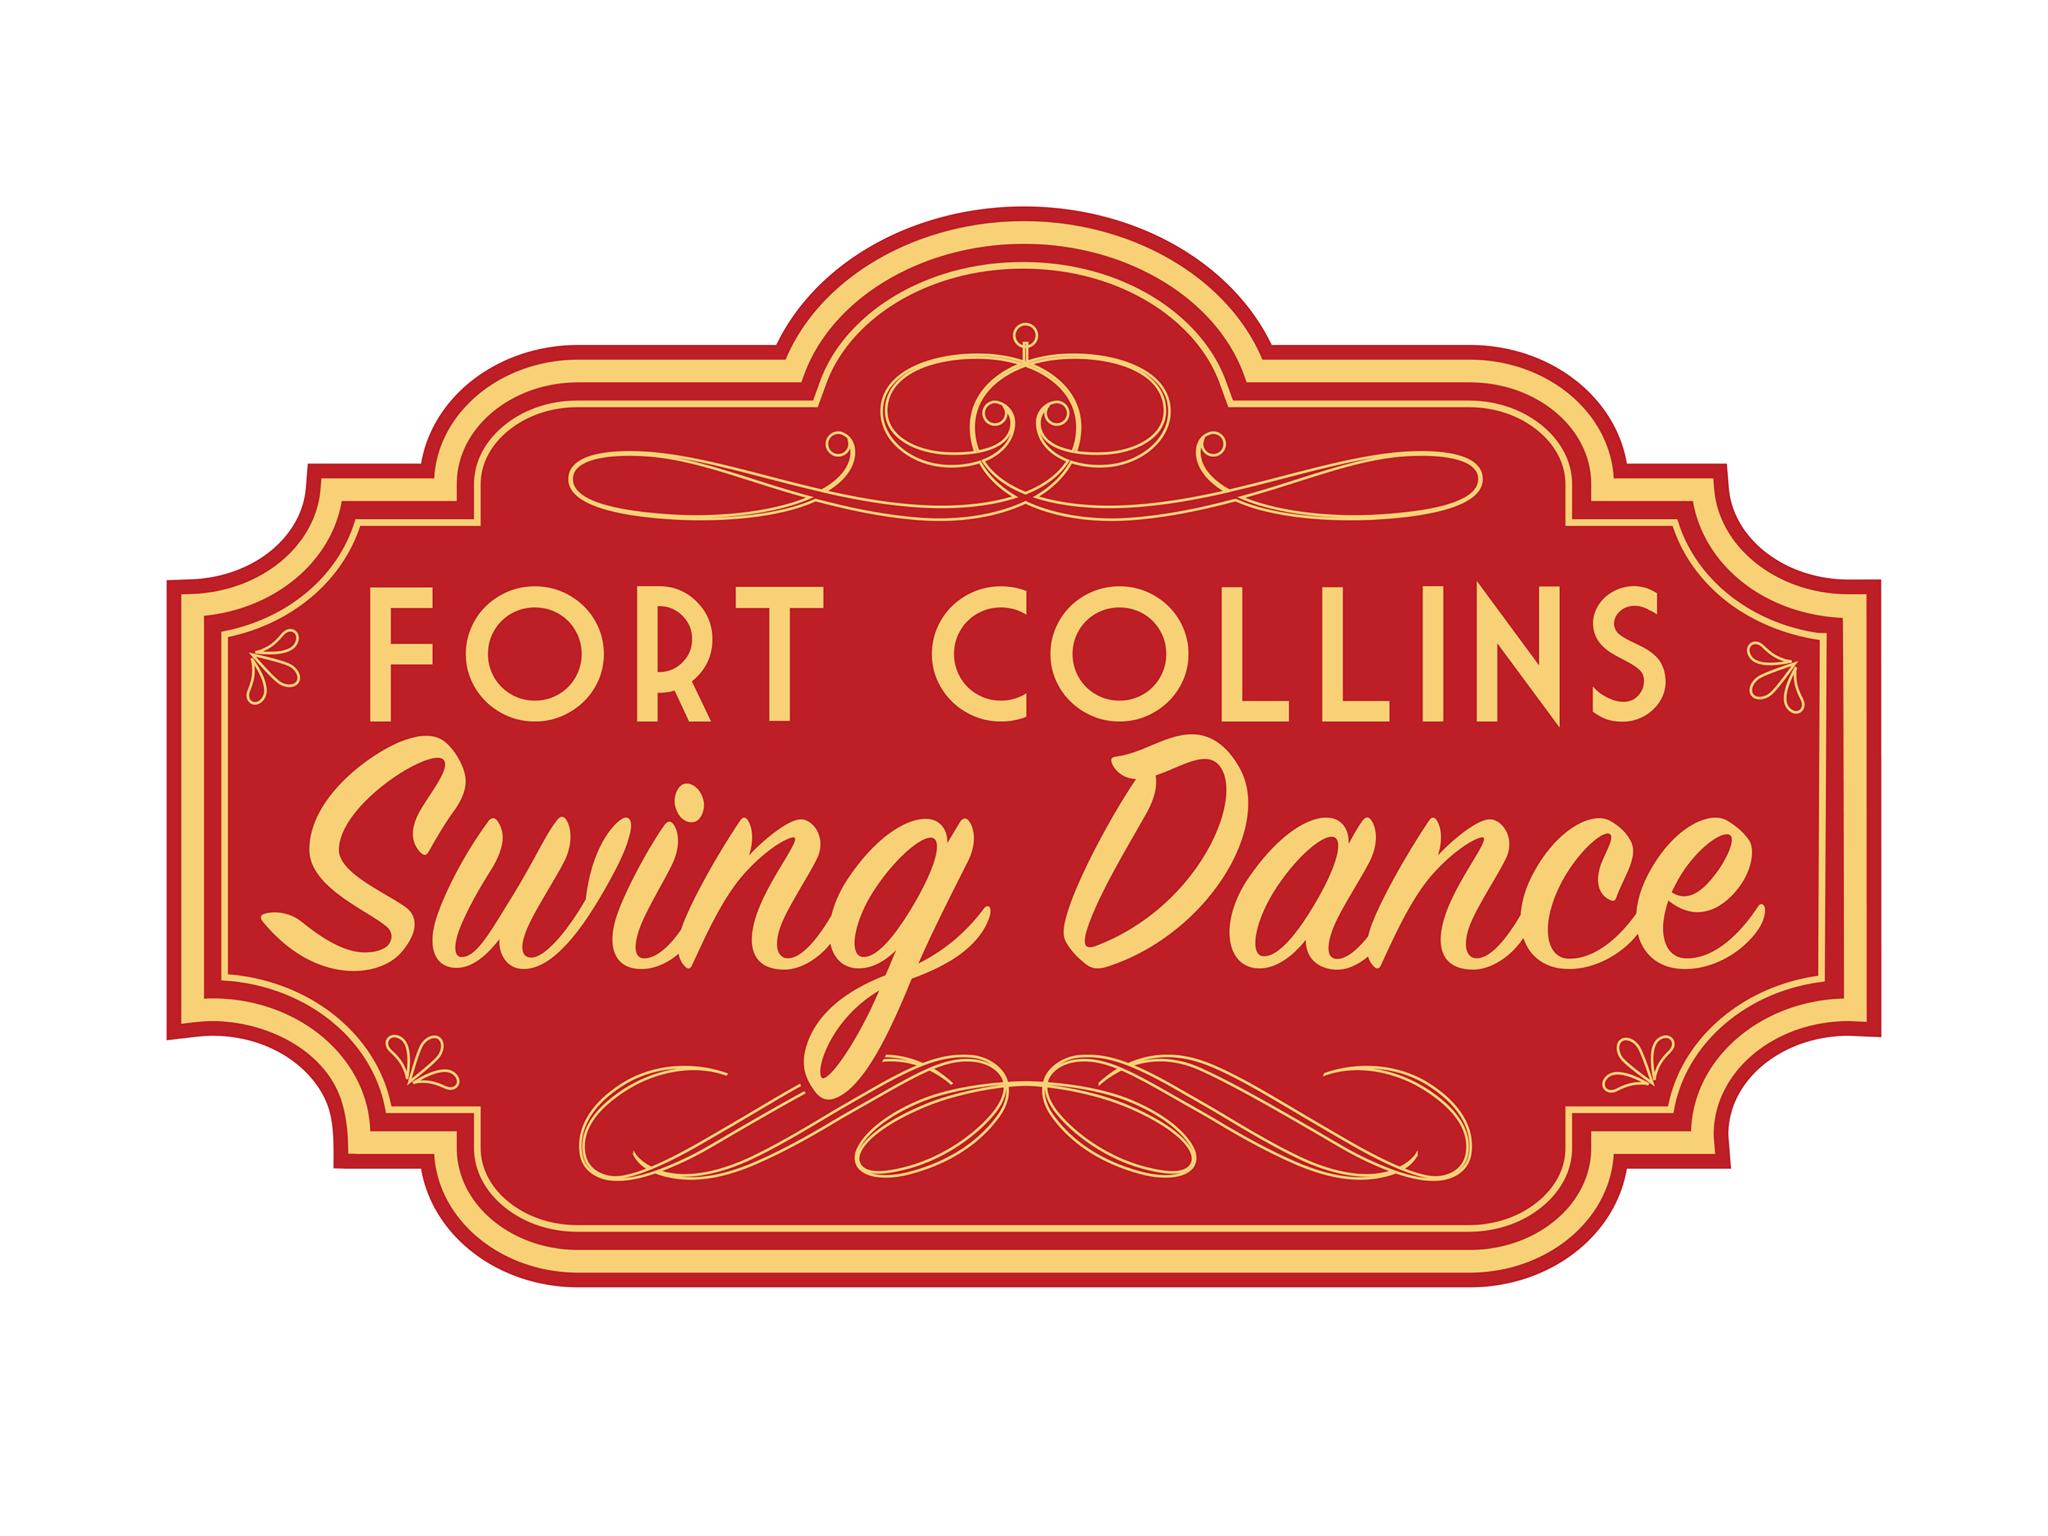 Fort Collins Swing Dance!